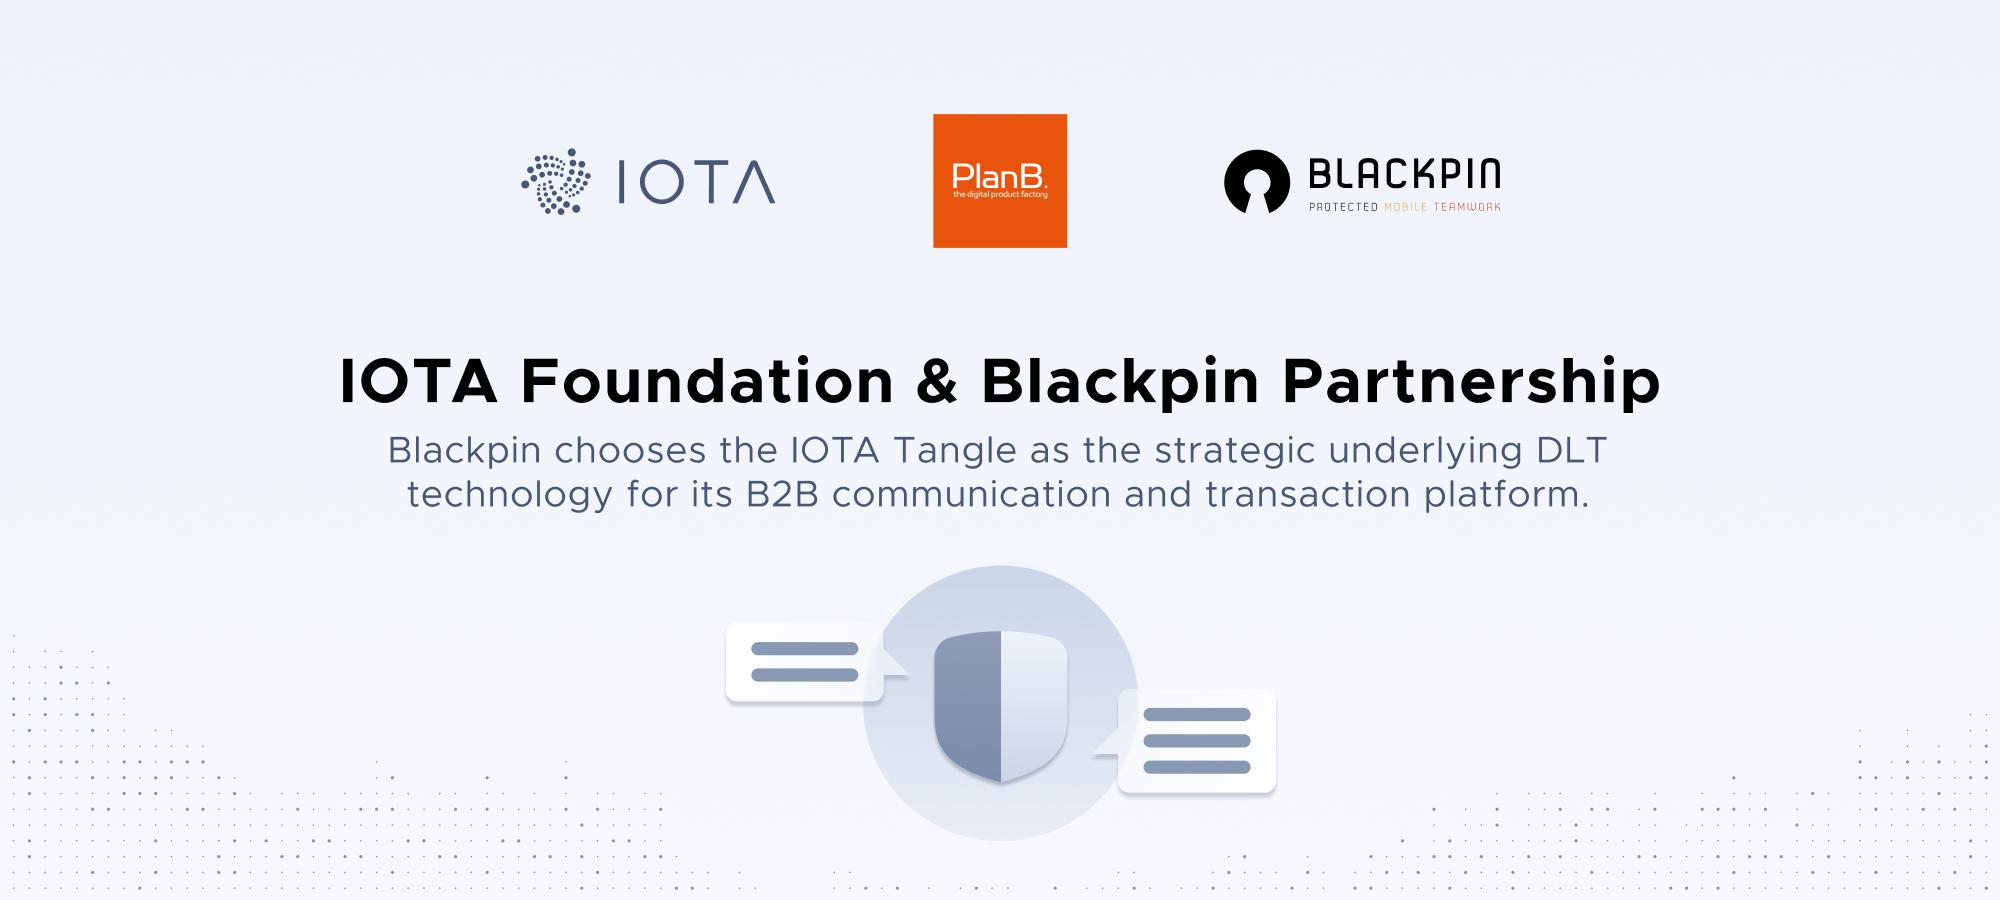 Blackpin chooses the IOTA Tangle as the strategic underlying DLT technology for its B2B communication and transaction platform